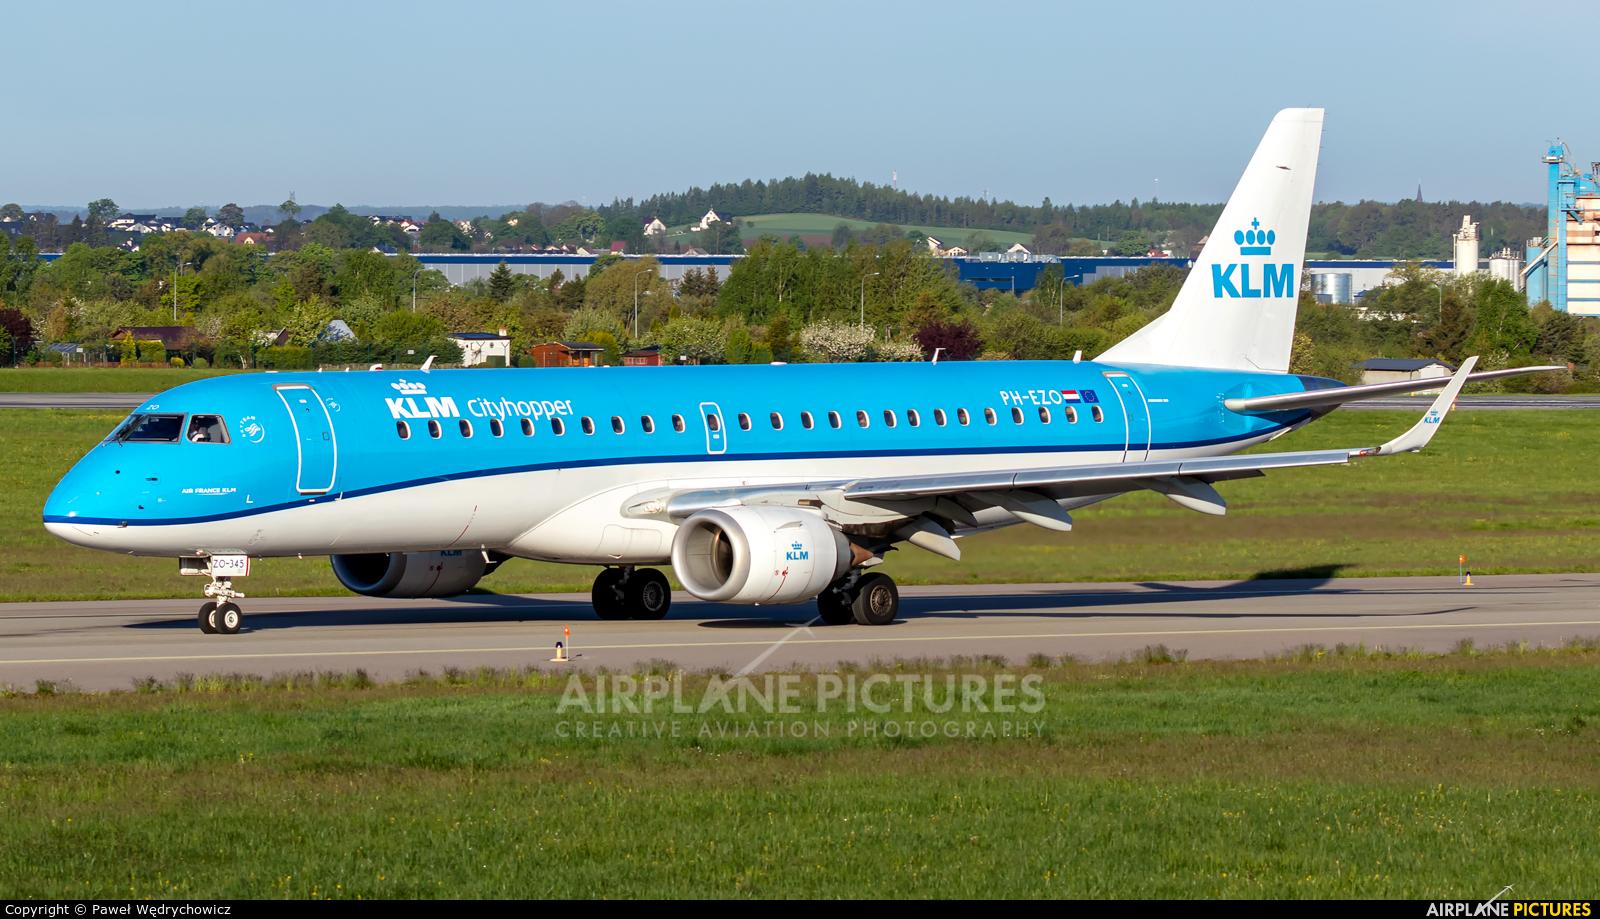 KLM Cityhopper PH-EZO aircraft at Gdańsk - Lech Wałęsa